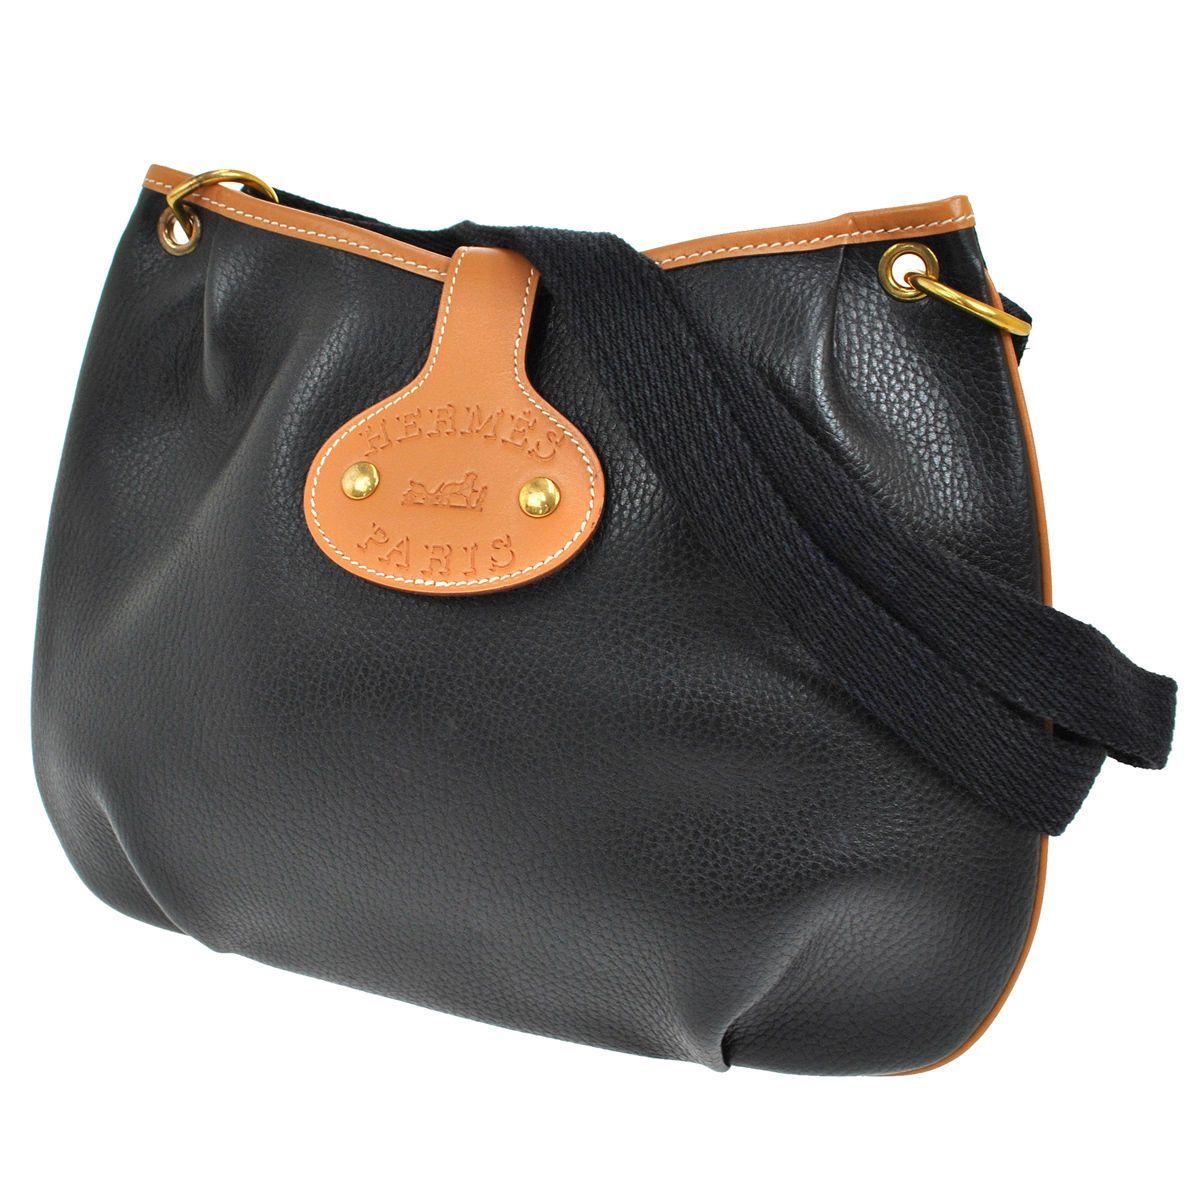 Authentic Hermes Rodeo Cross Body Shoulder Bag Black Ardennes France Vtg  RK09671  4080676ed4